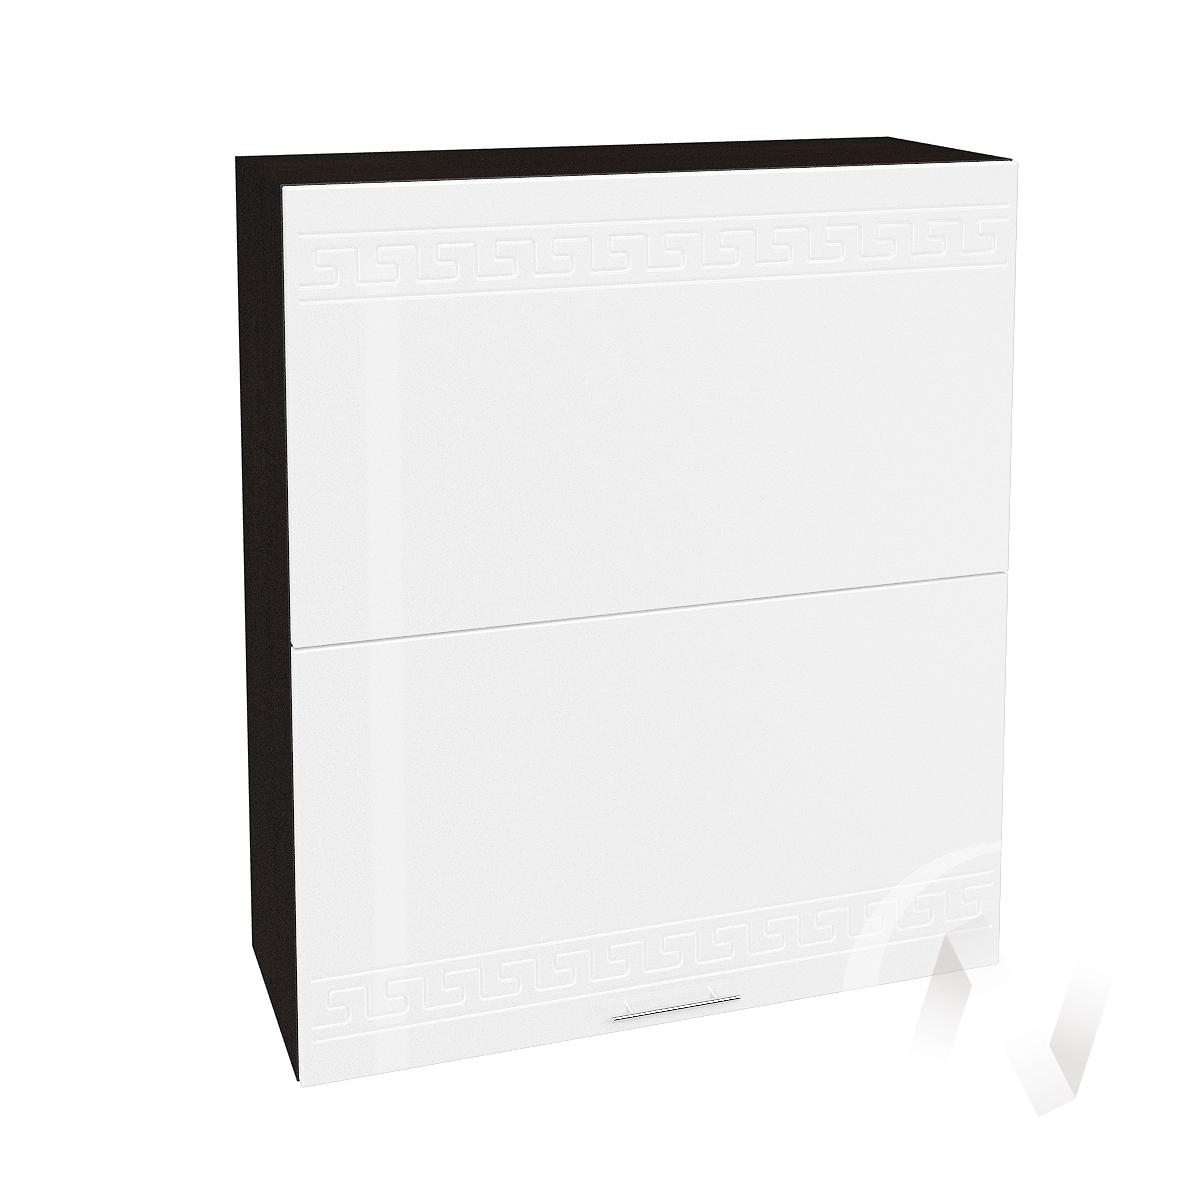 "Кухня ""Греция"": Шкаф верхний горизонтальный 802, ШВГ 802 (белый металлик/корпус венге)"